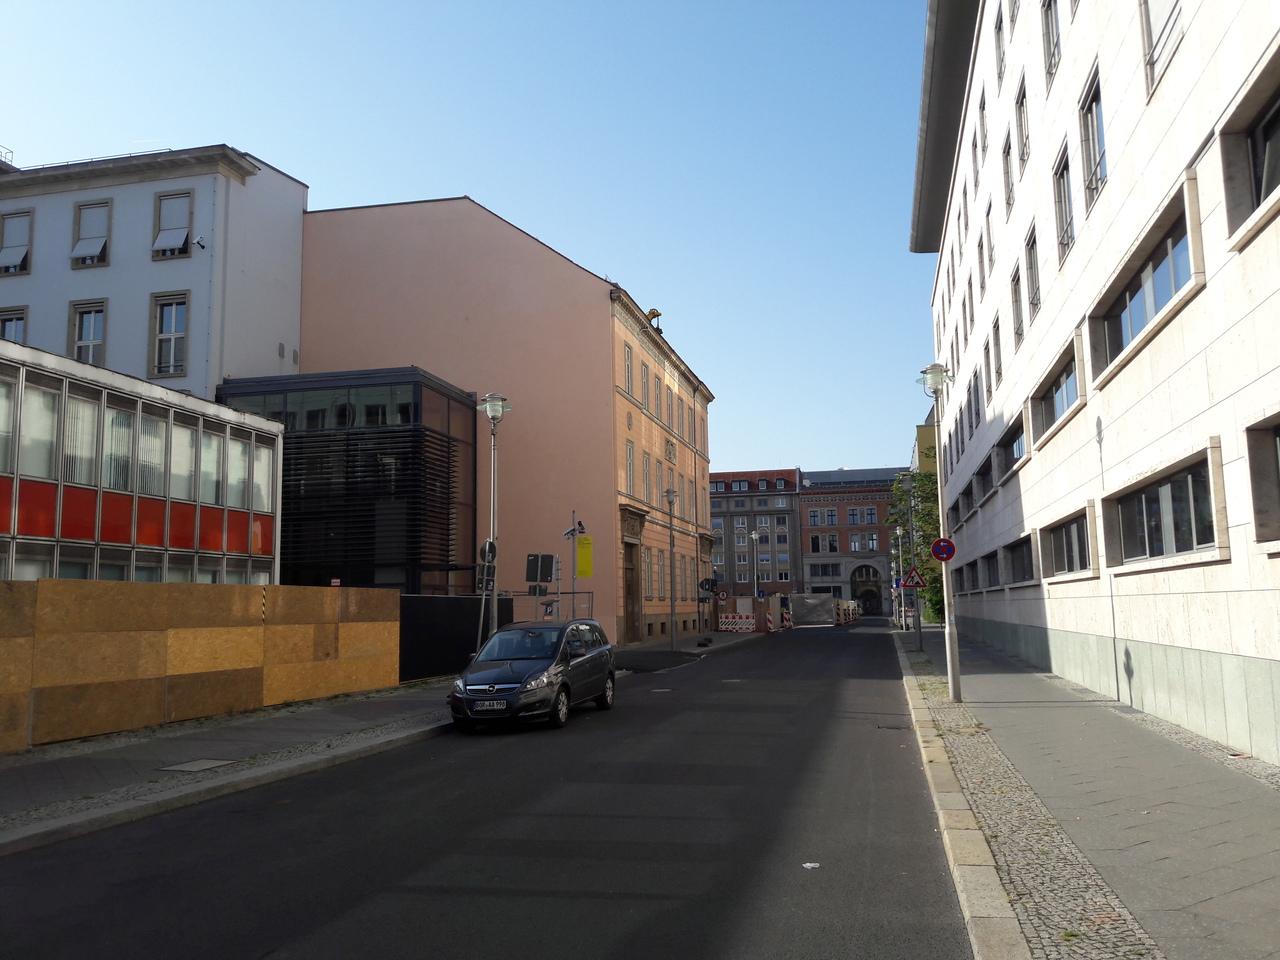 abriss-schadowstrassegjj5f.jpg